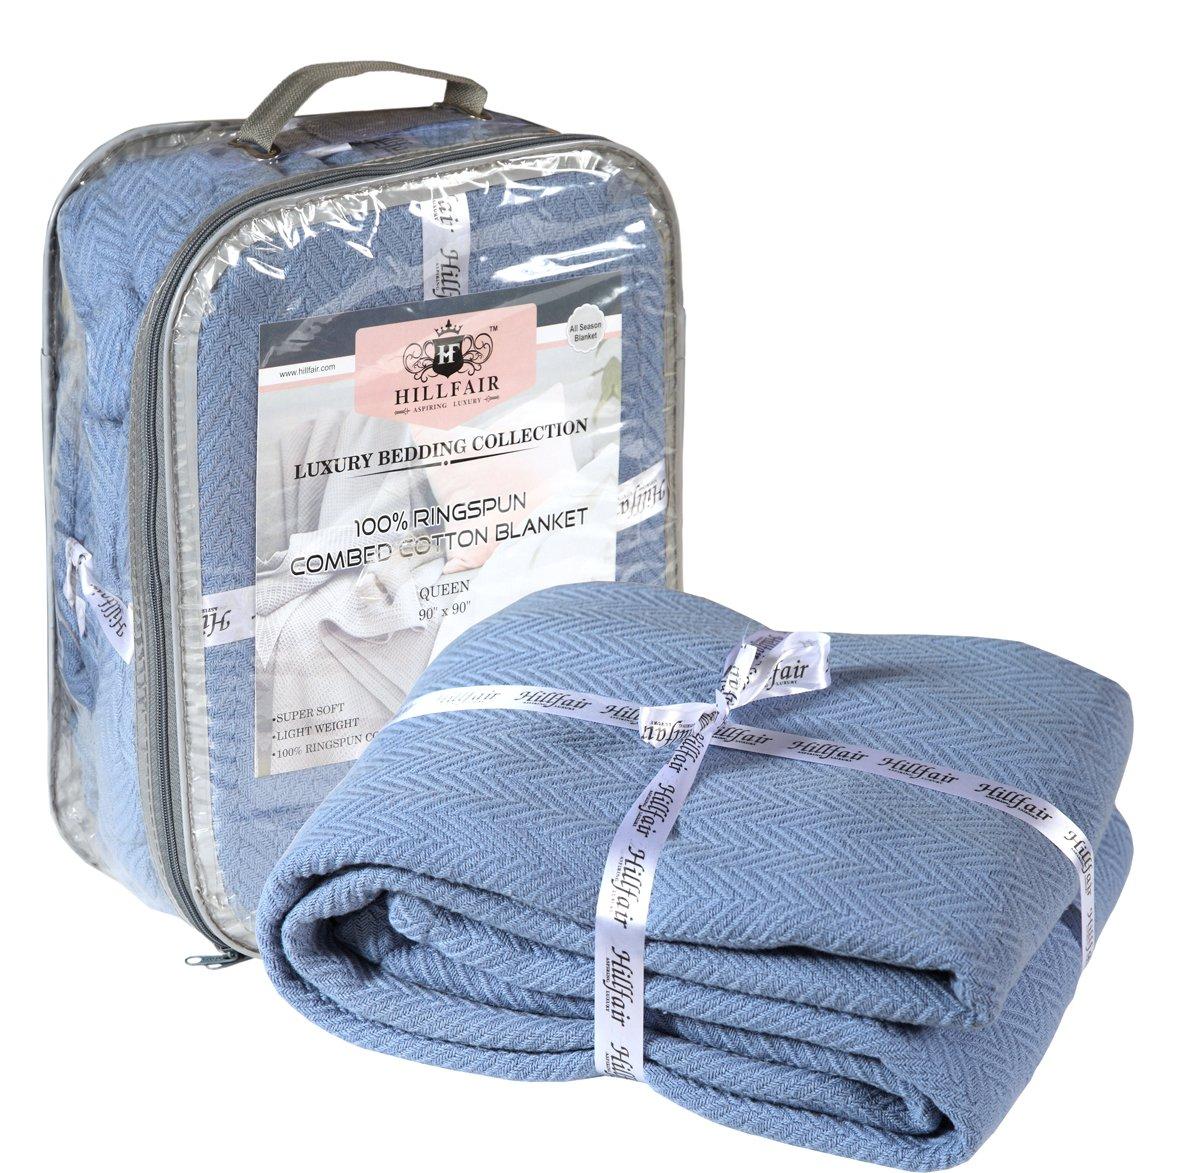 HILLFAIR 100% Ringspun Combed Cotton Blanket - Herringbone Cotton Blanket- Twin Blankets - Cotton Thermal Blankets - Soft Light Weight Cotton Blanket – Twin Bed Blankets– White Cotton Blankets